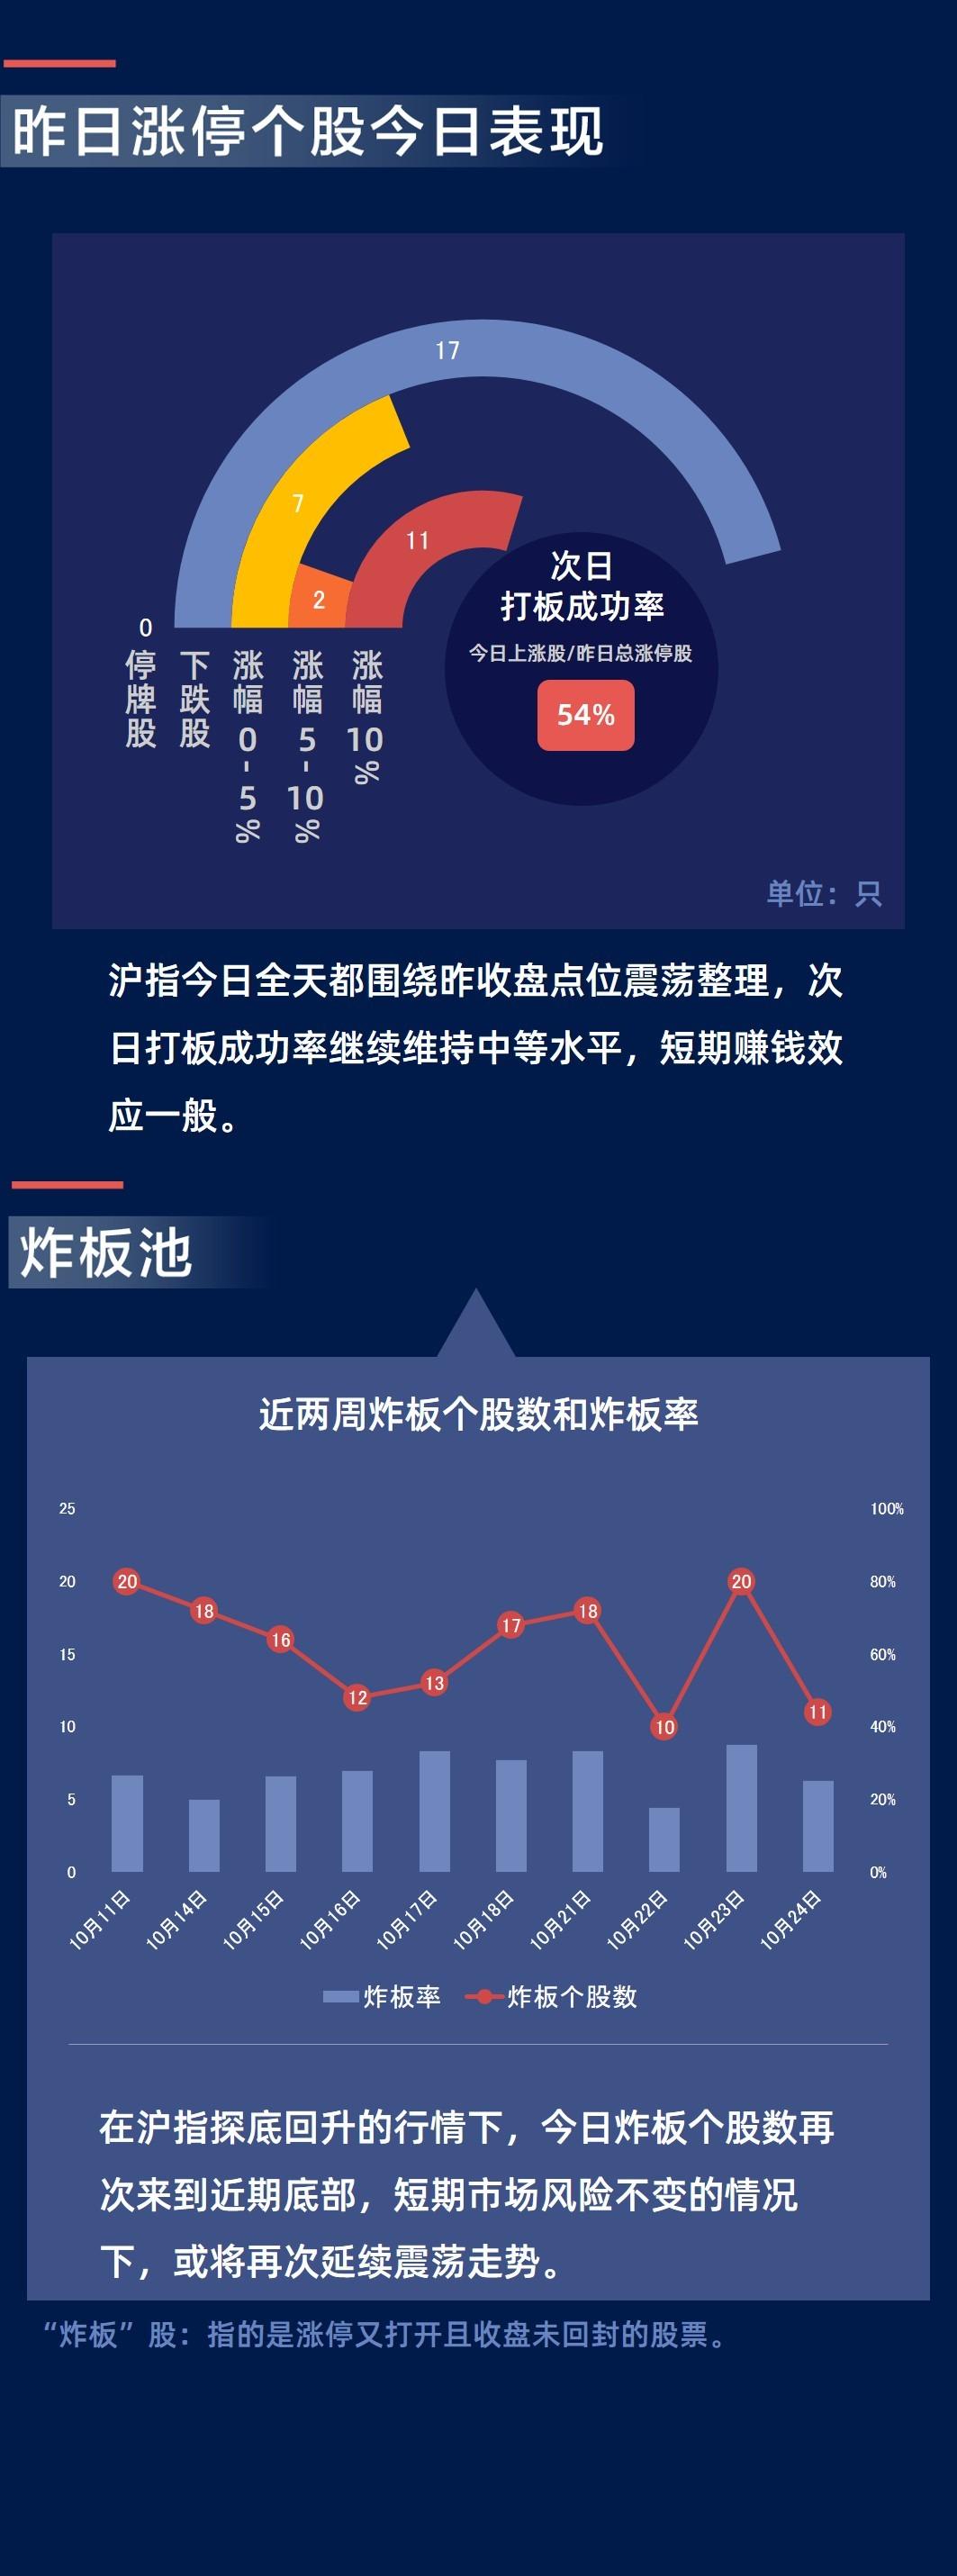 「lg贵宾区」永州联通5G赋能智慧交通